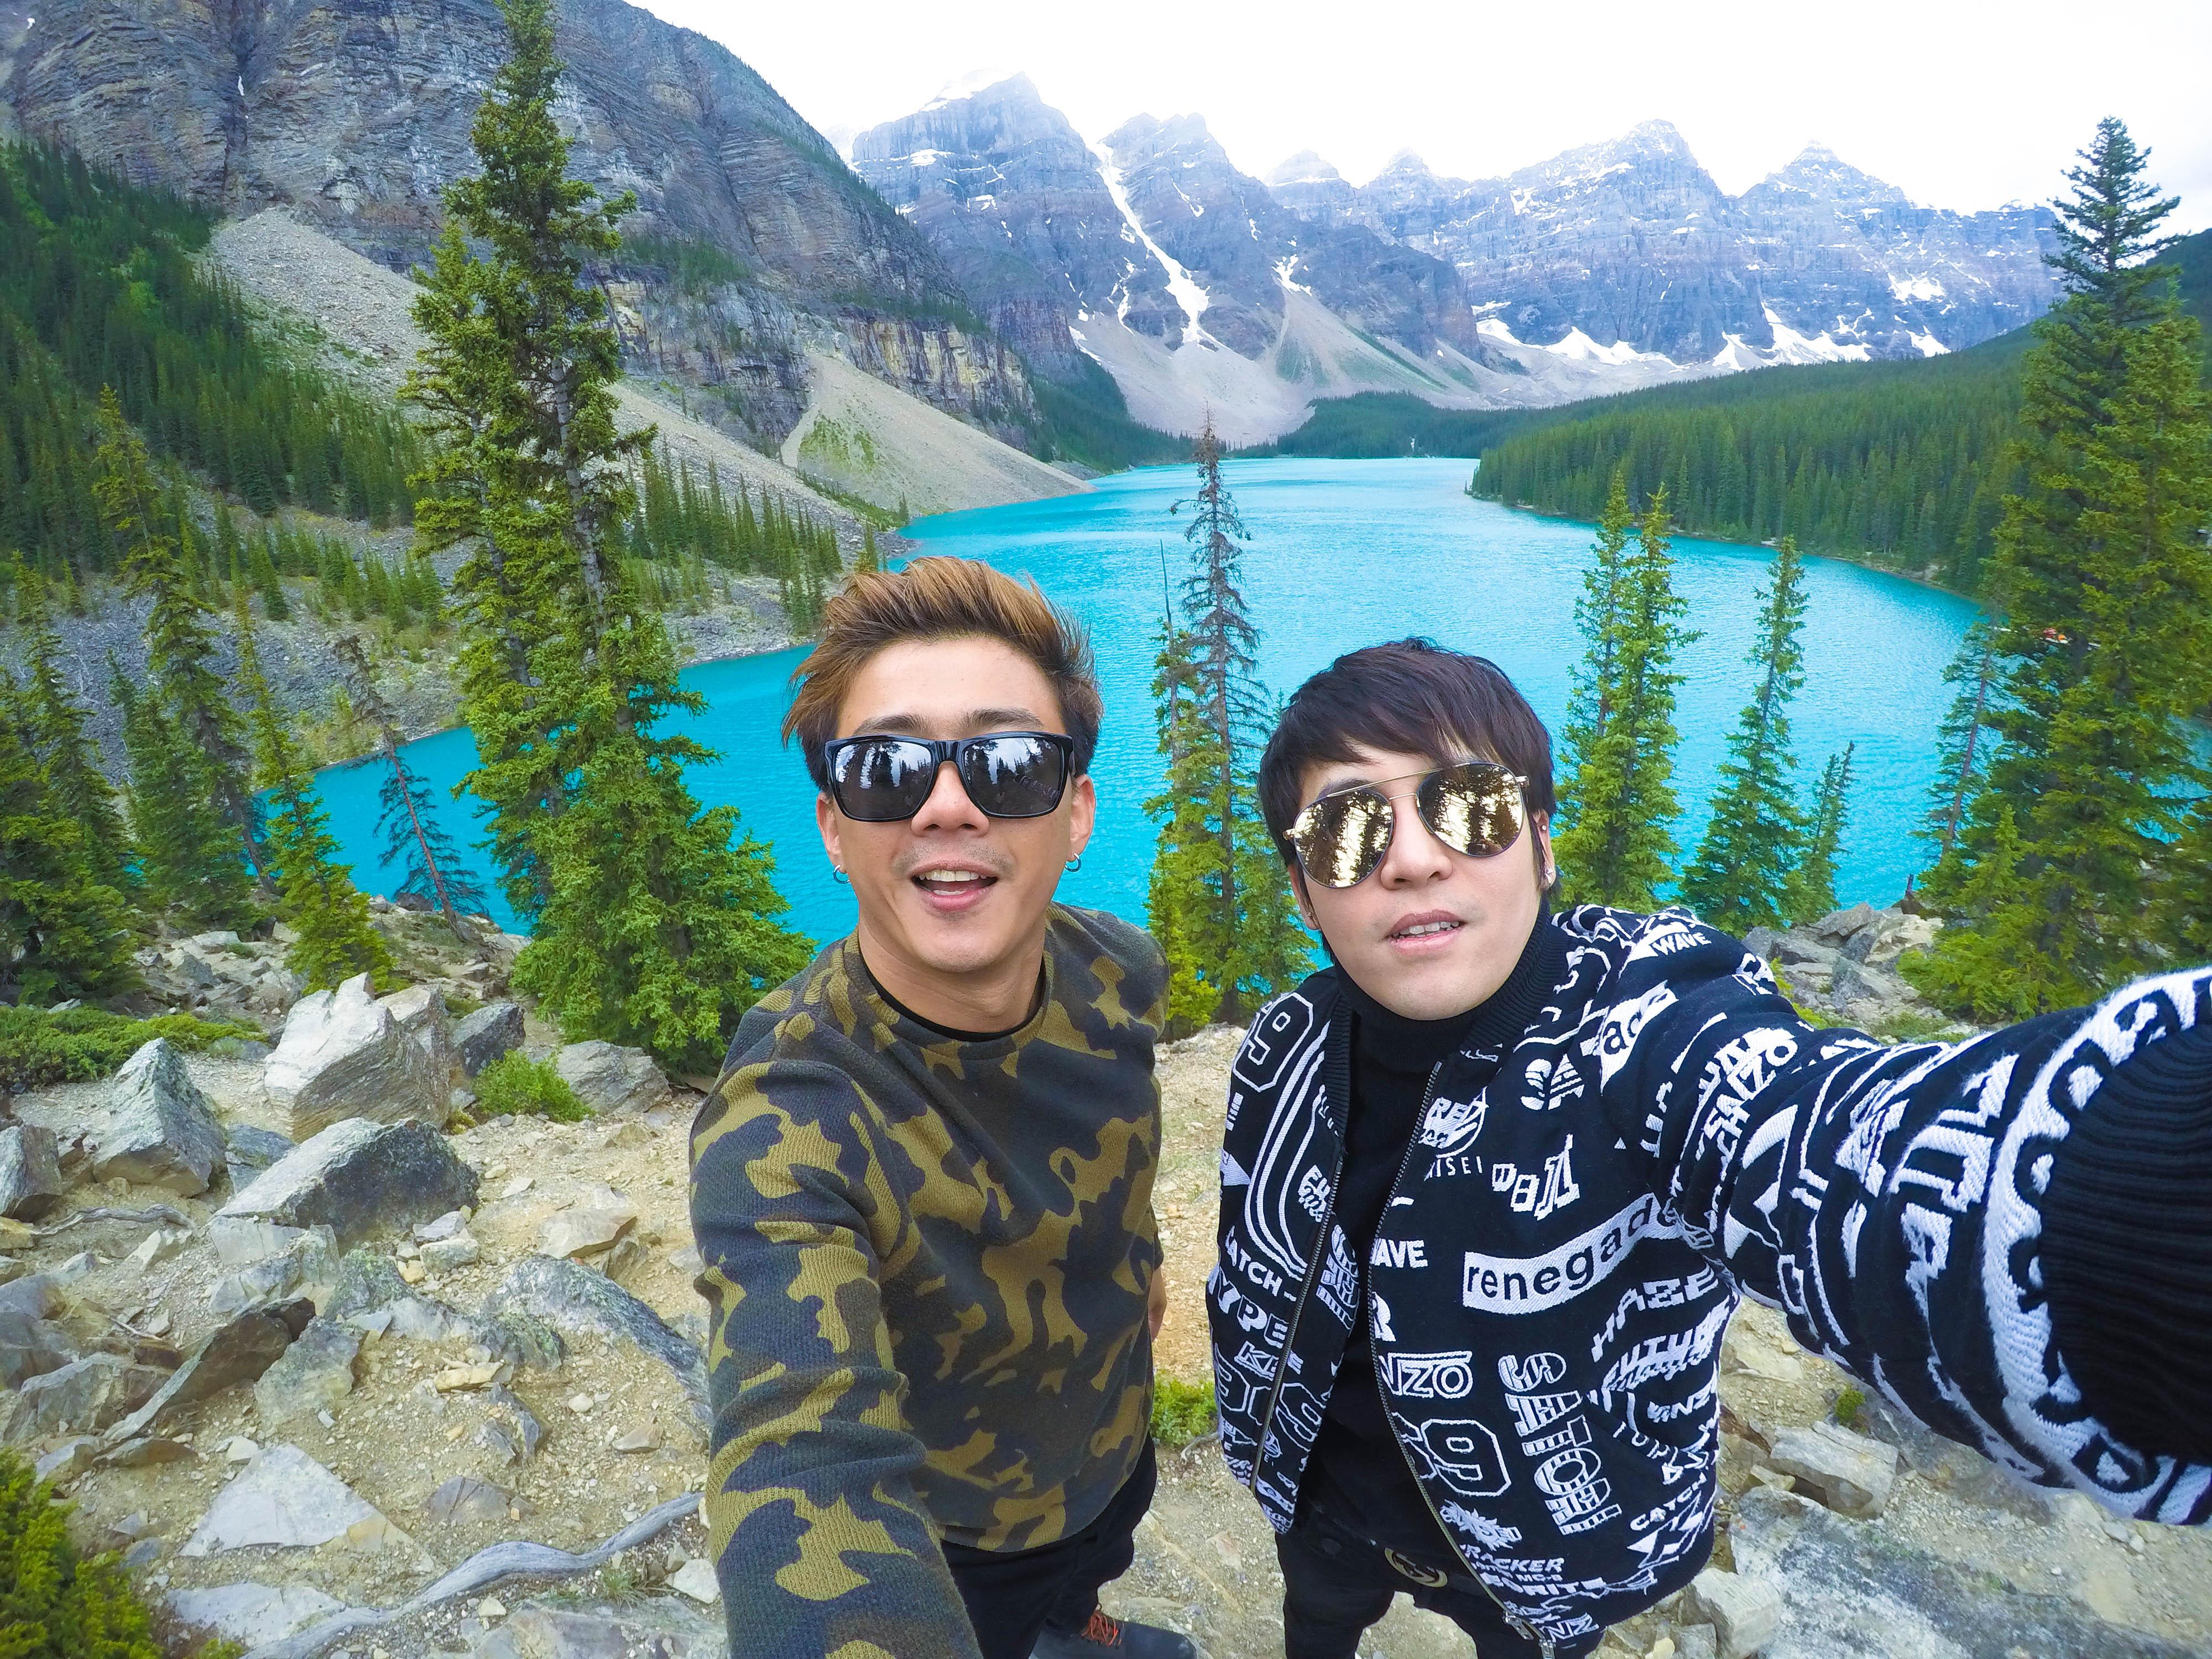 Moraine Lake เที่ยวแคนาดา ทัวร์แคนาดา